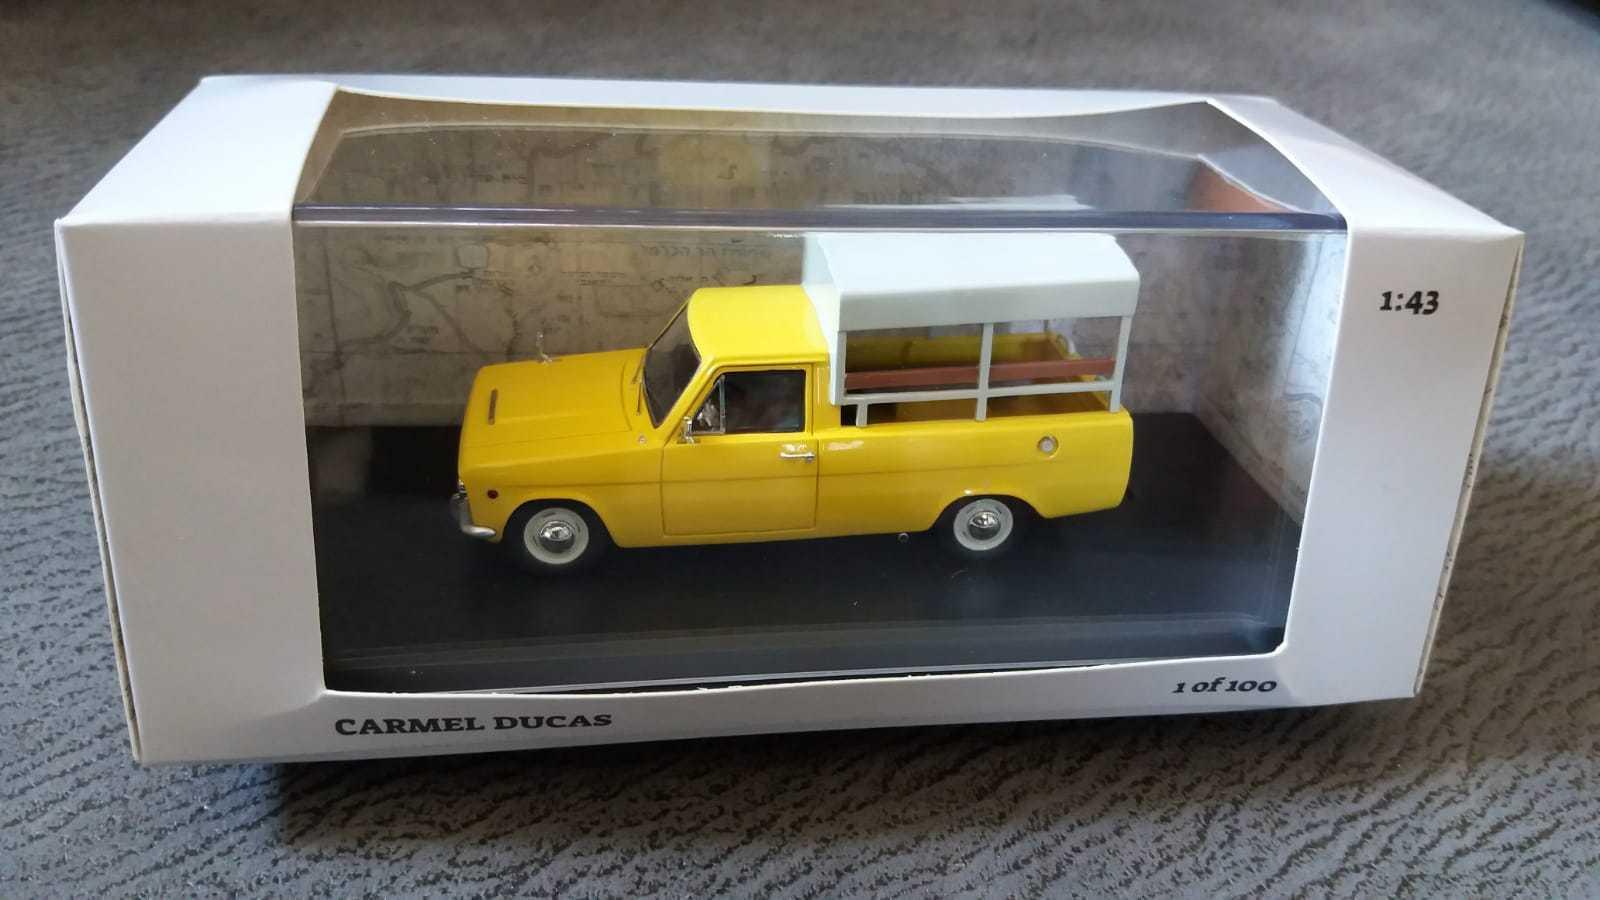 Carmel Carmel Carmel Ducas Miniature Car Model Israel Resin 1 43 Scale  Unique Susita Vintage 5bc95a